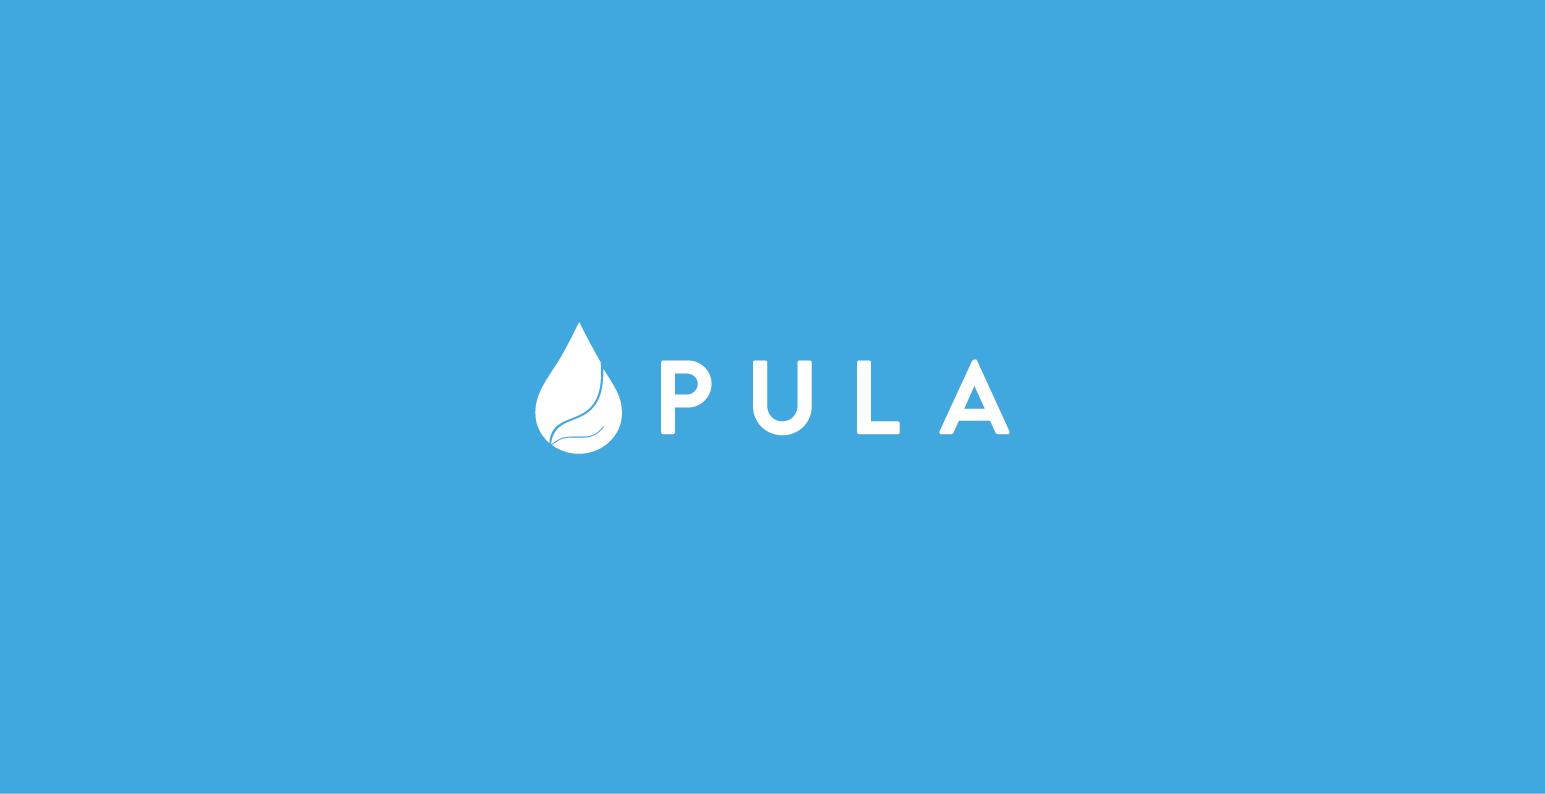 PULA-04.jpg